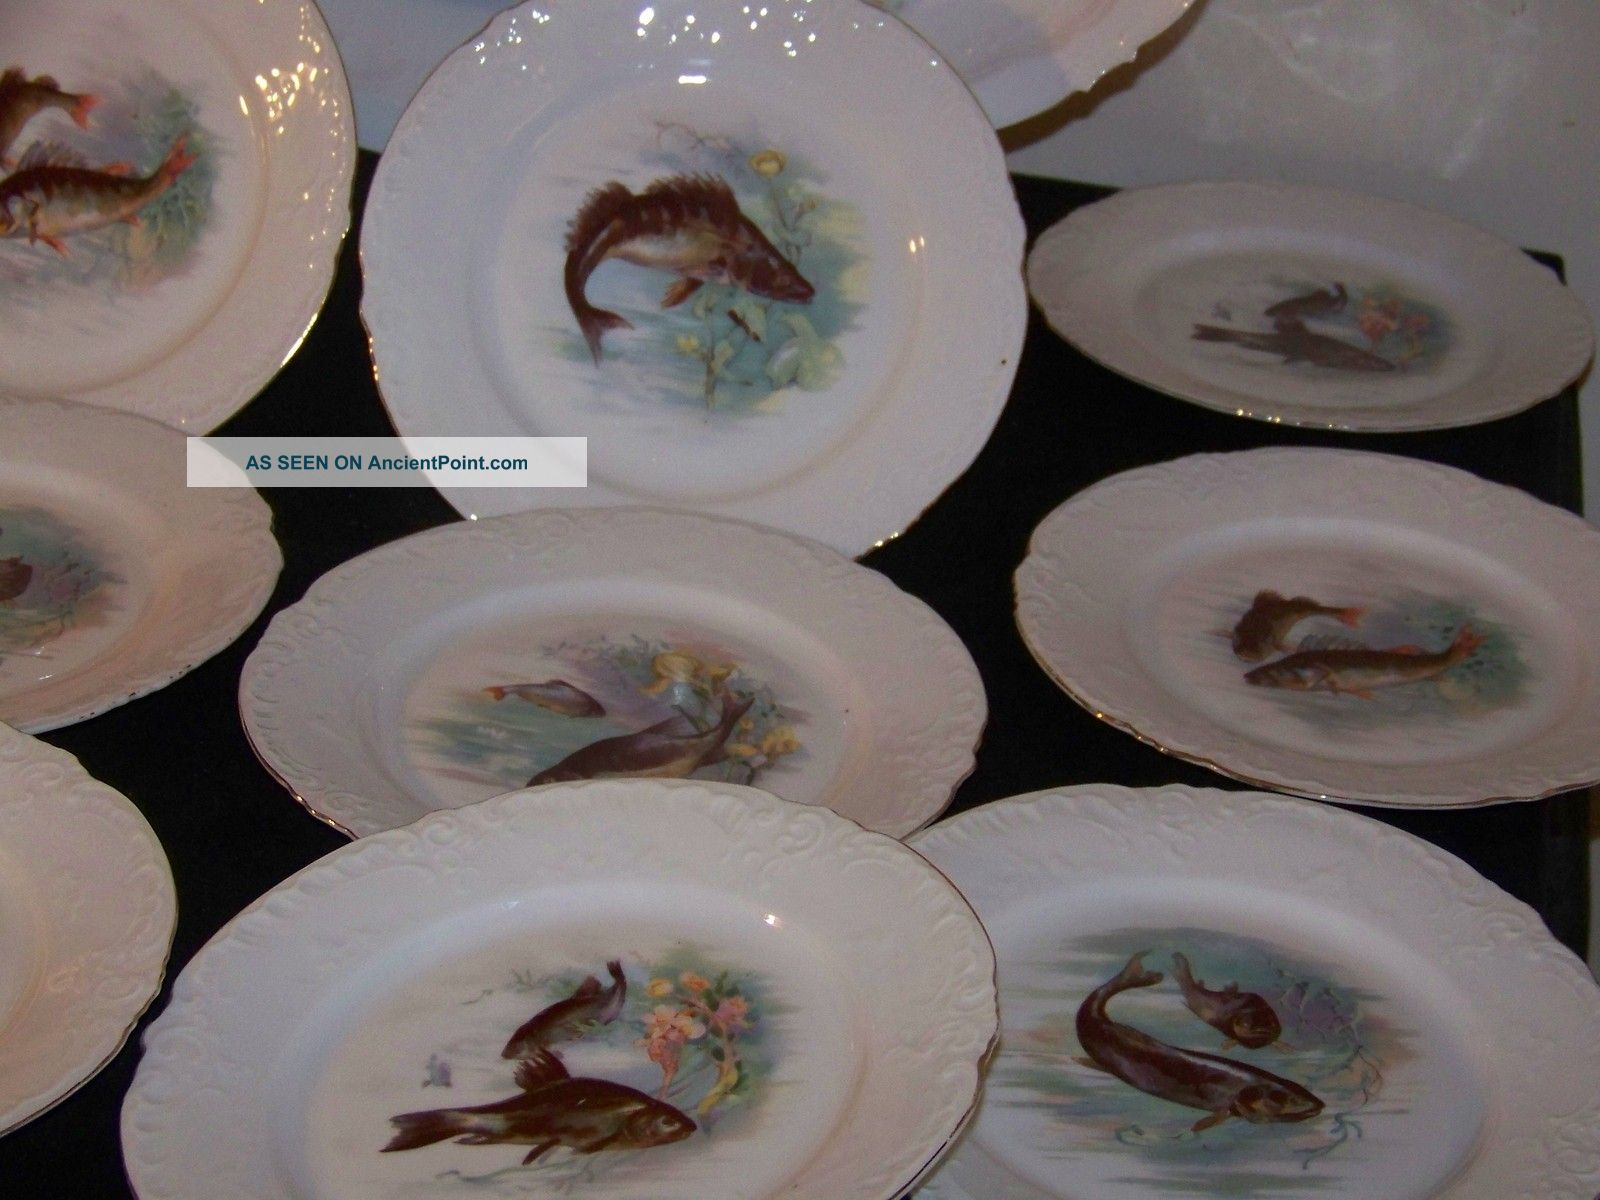 Antique Victoria Carlsbad Austria Complete Porcelain Fish Plates \u0026 Platter Set & Antique Victoria Carlsbad Austria Complete Porcelain Fish Plates ...